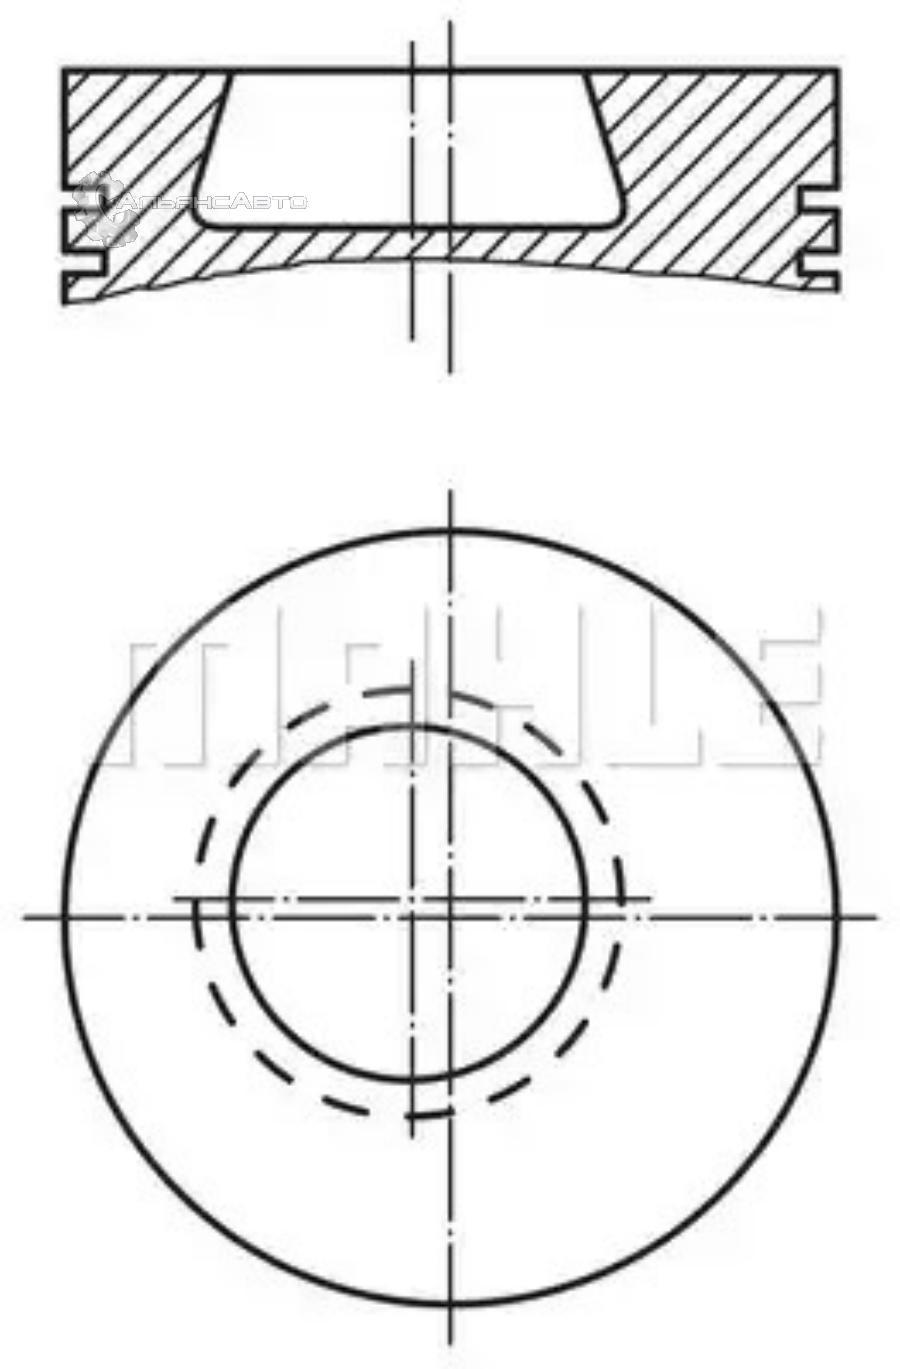 Поршнекомплект  d97.5  93951600  MAHLE  МВ ОМ364/366 STD 3 кольца R4/6  0028000    (3660372001/3660302117)